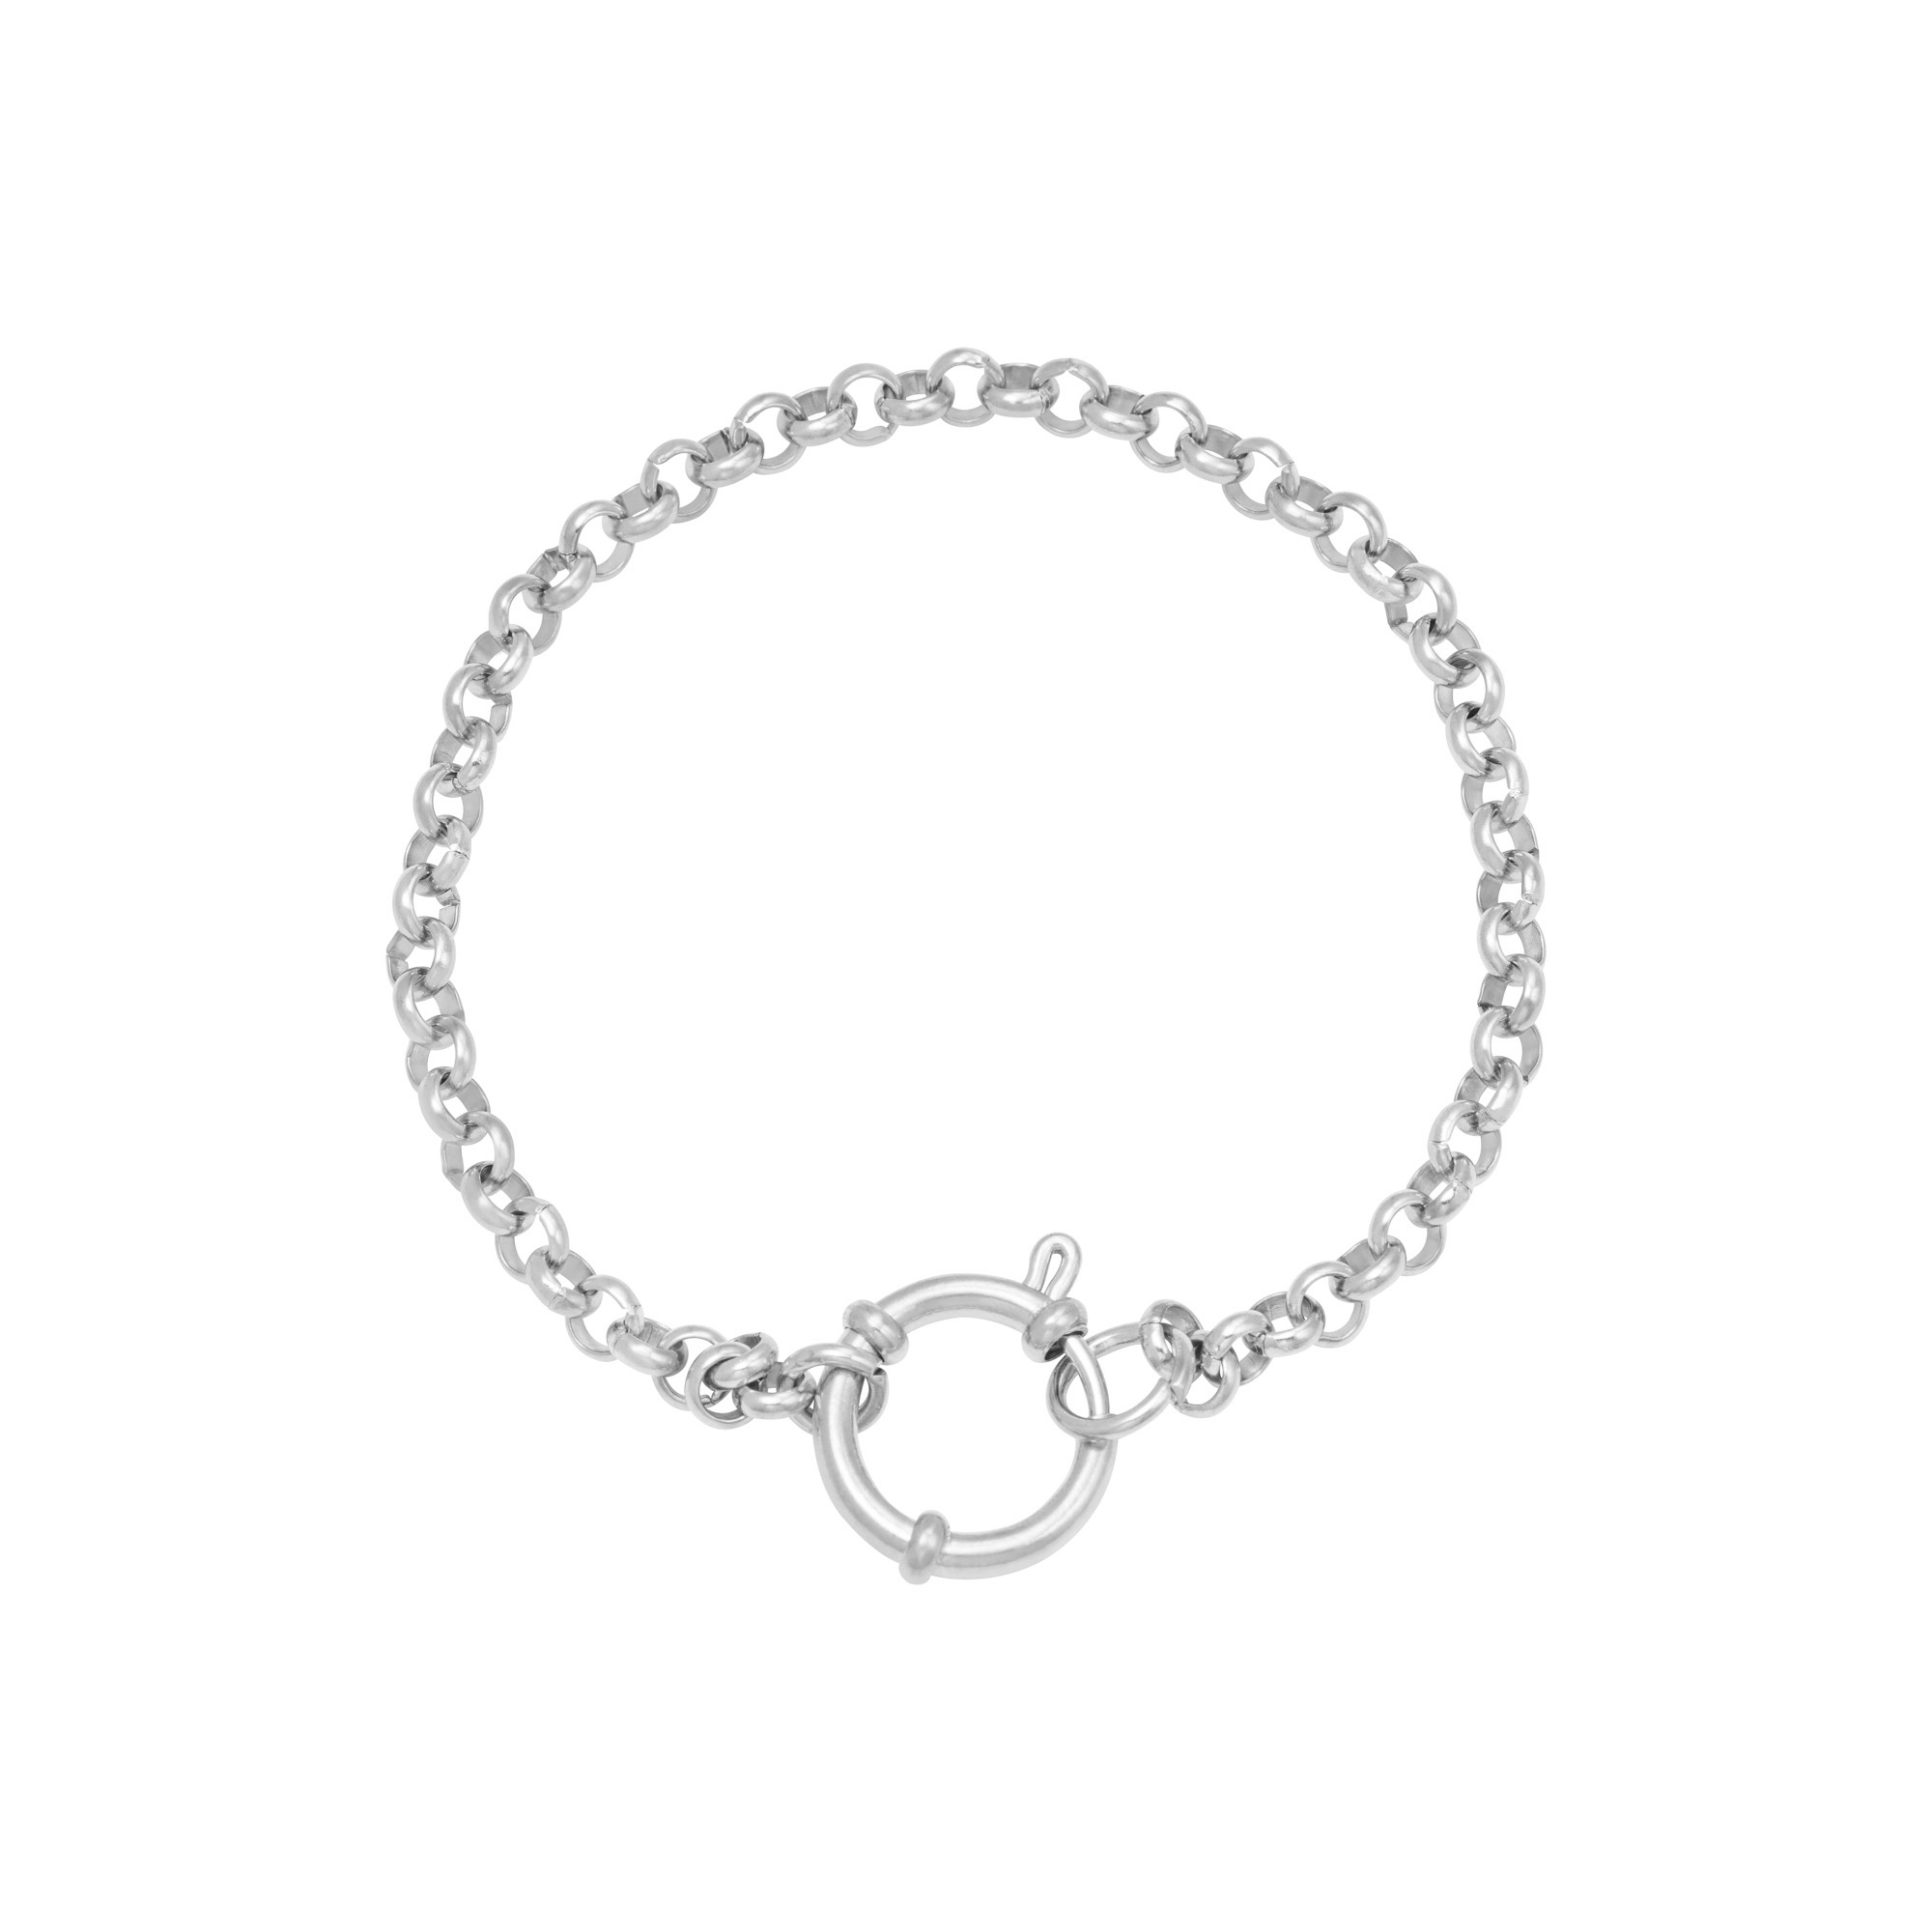 Bracelet Chain Rylee